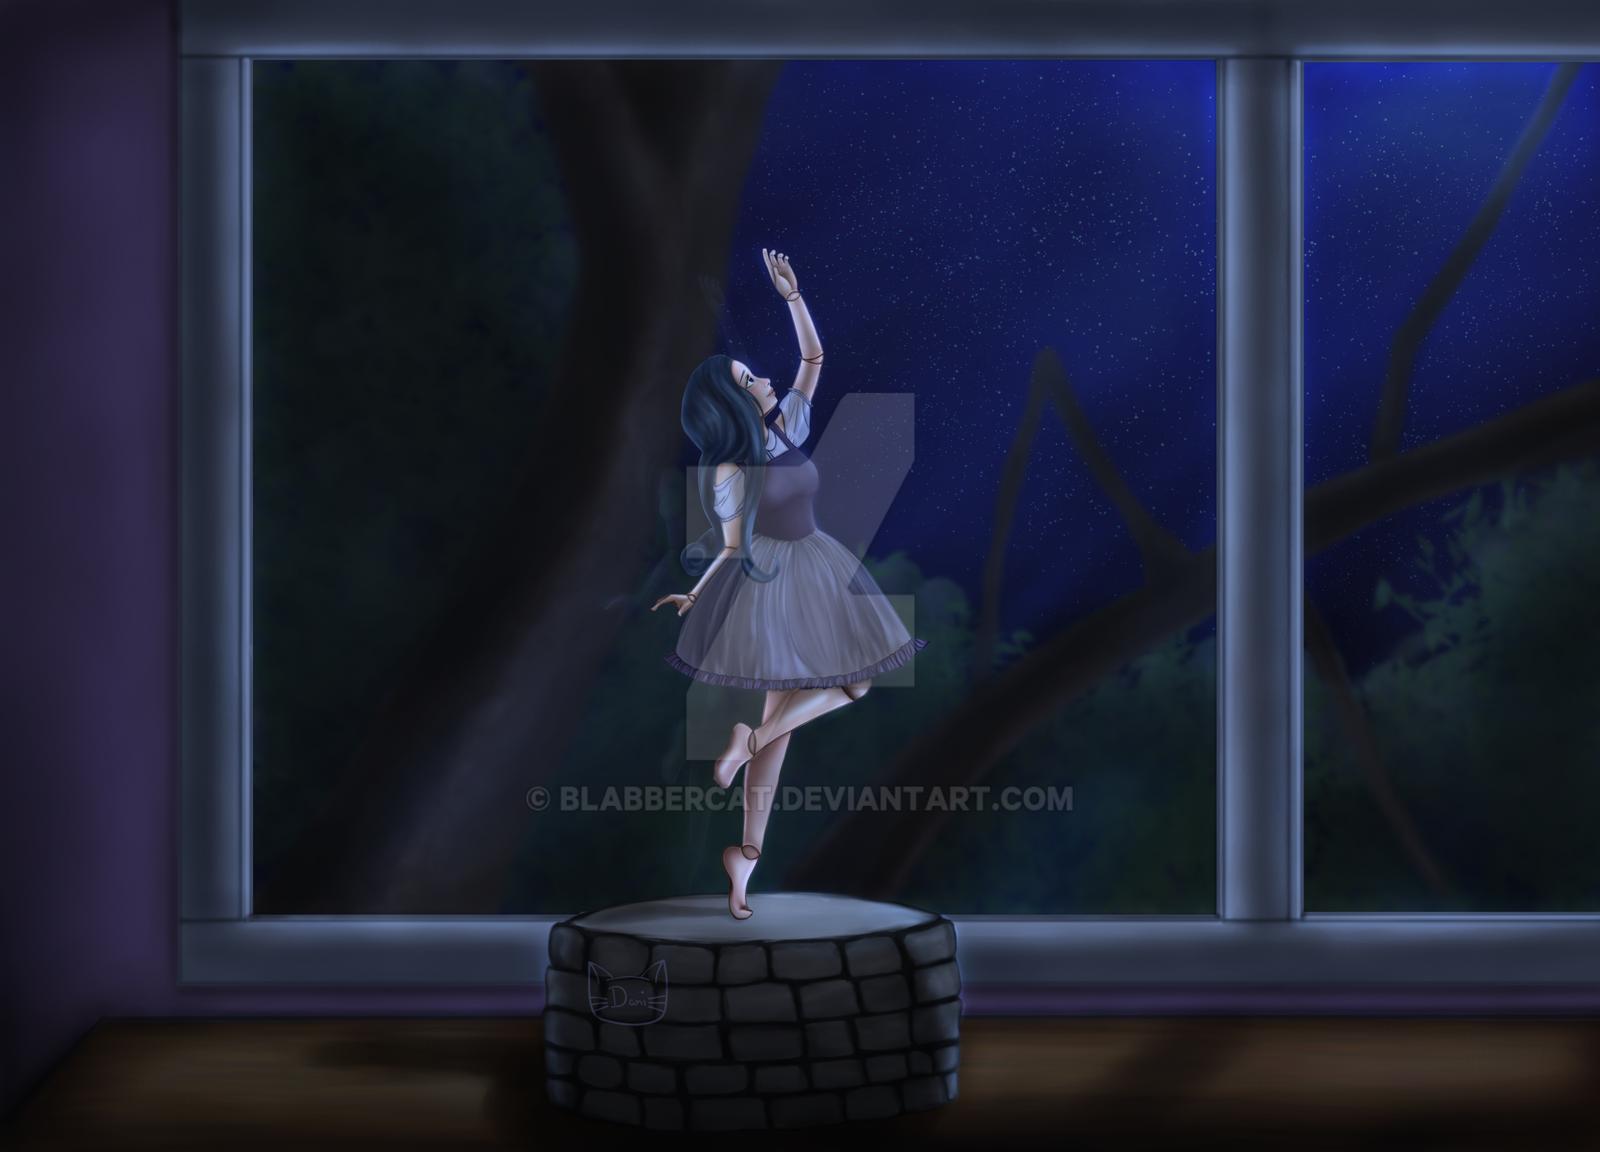 Doll in Moonlight by Blabbercat